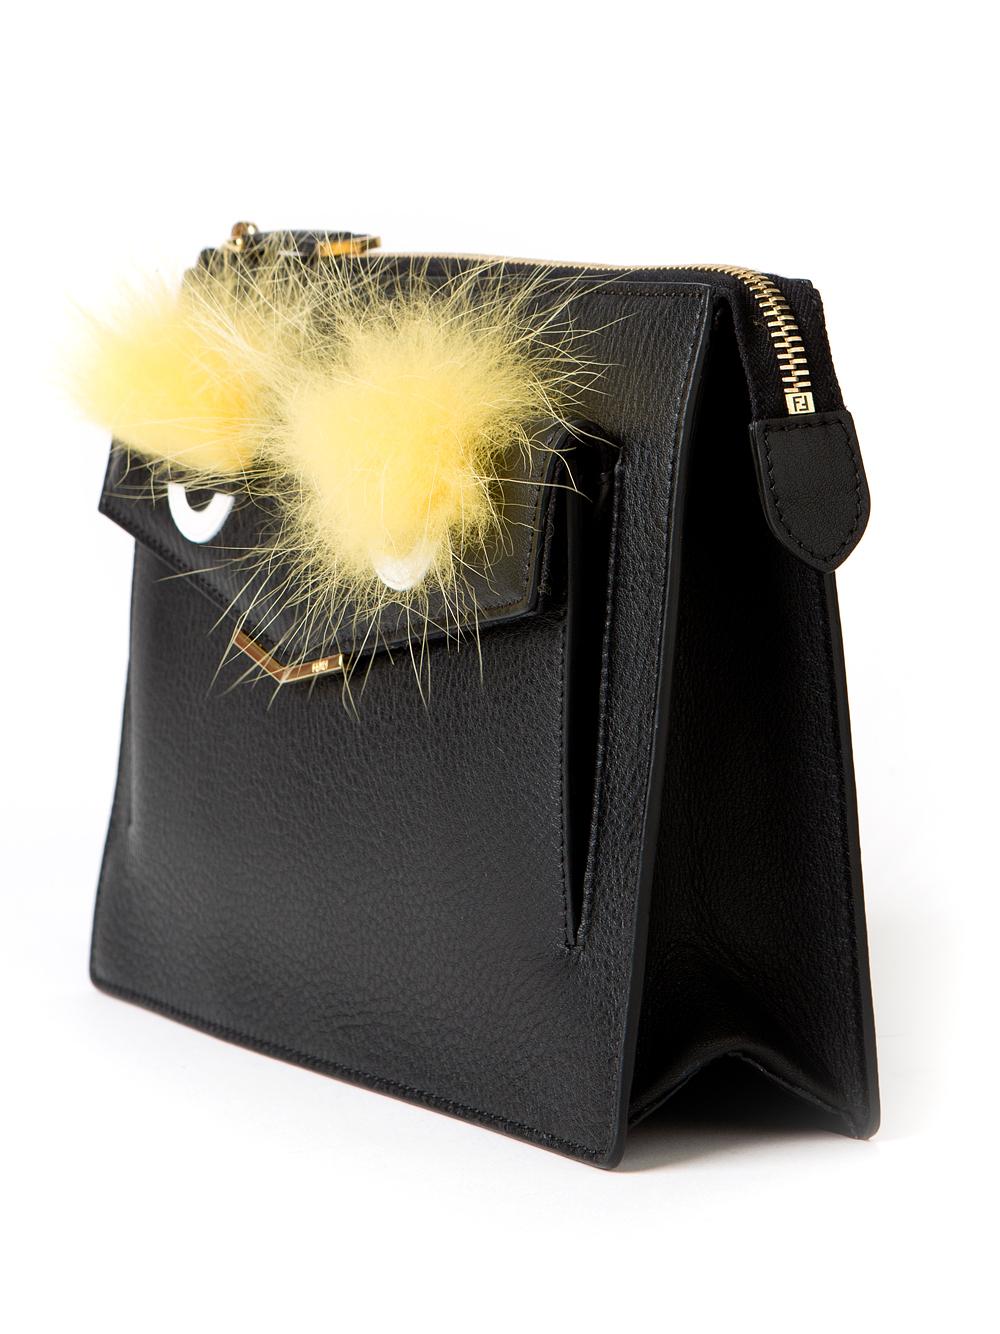 fendi mens boots fendi sling bag price fendi by fendi f98b4b099e522